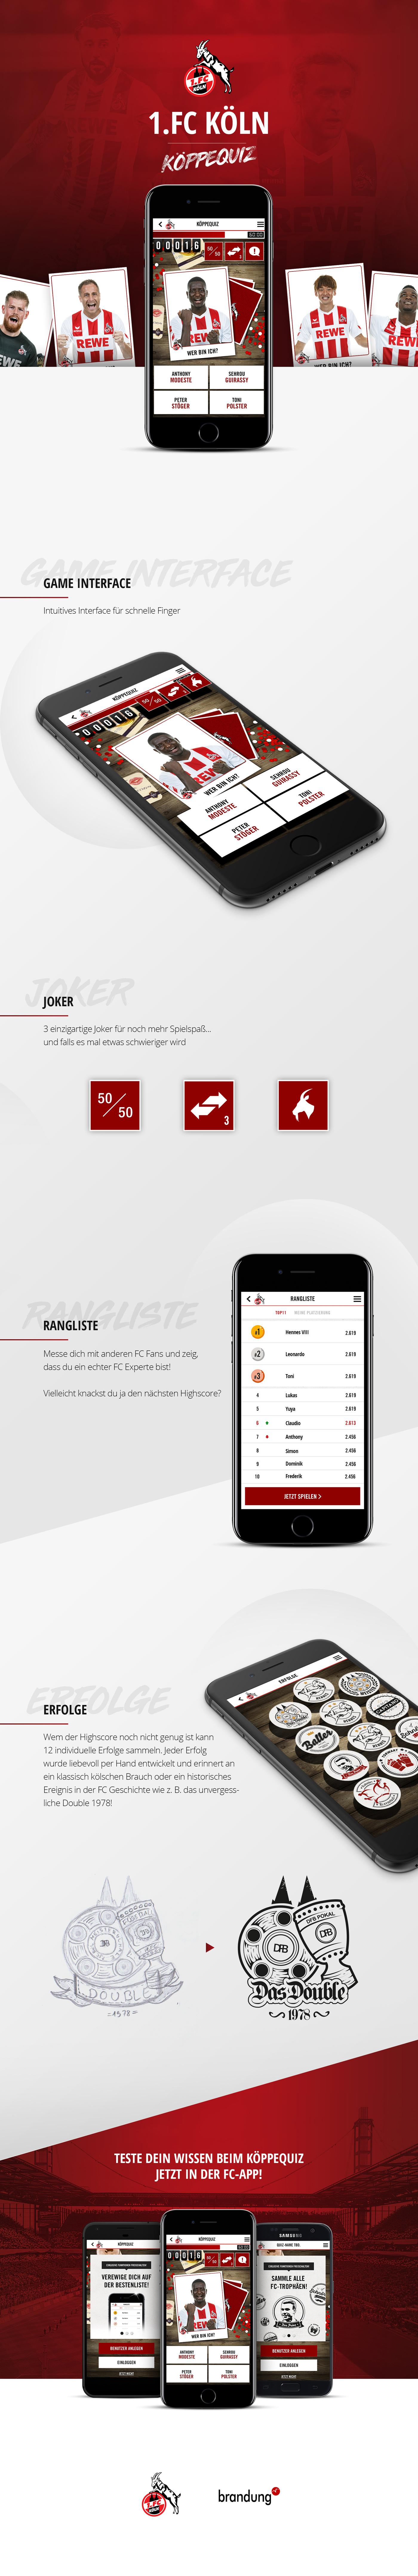 köln FC cologne mobile app design game Quiz Fussball soccer